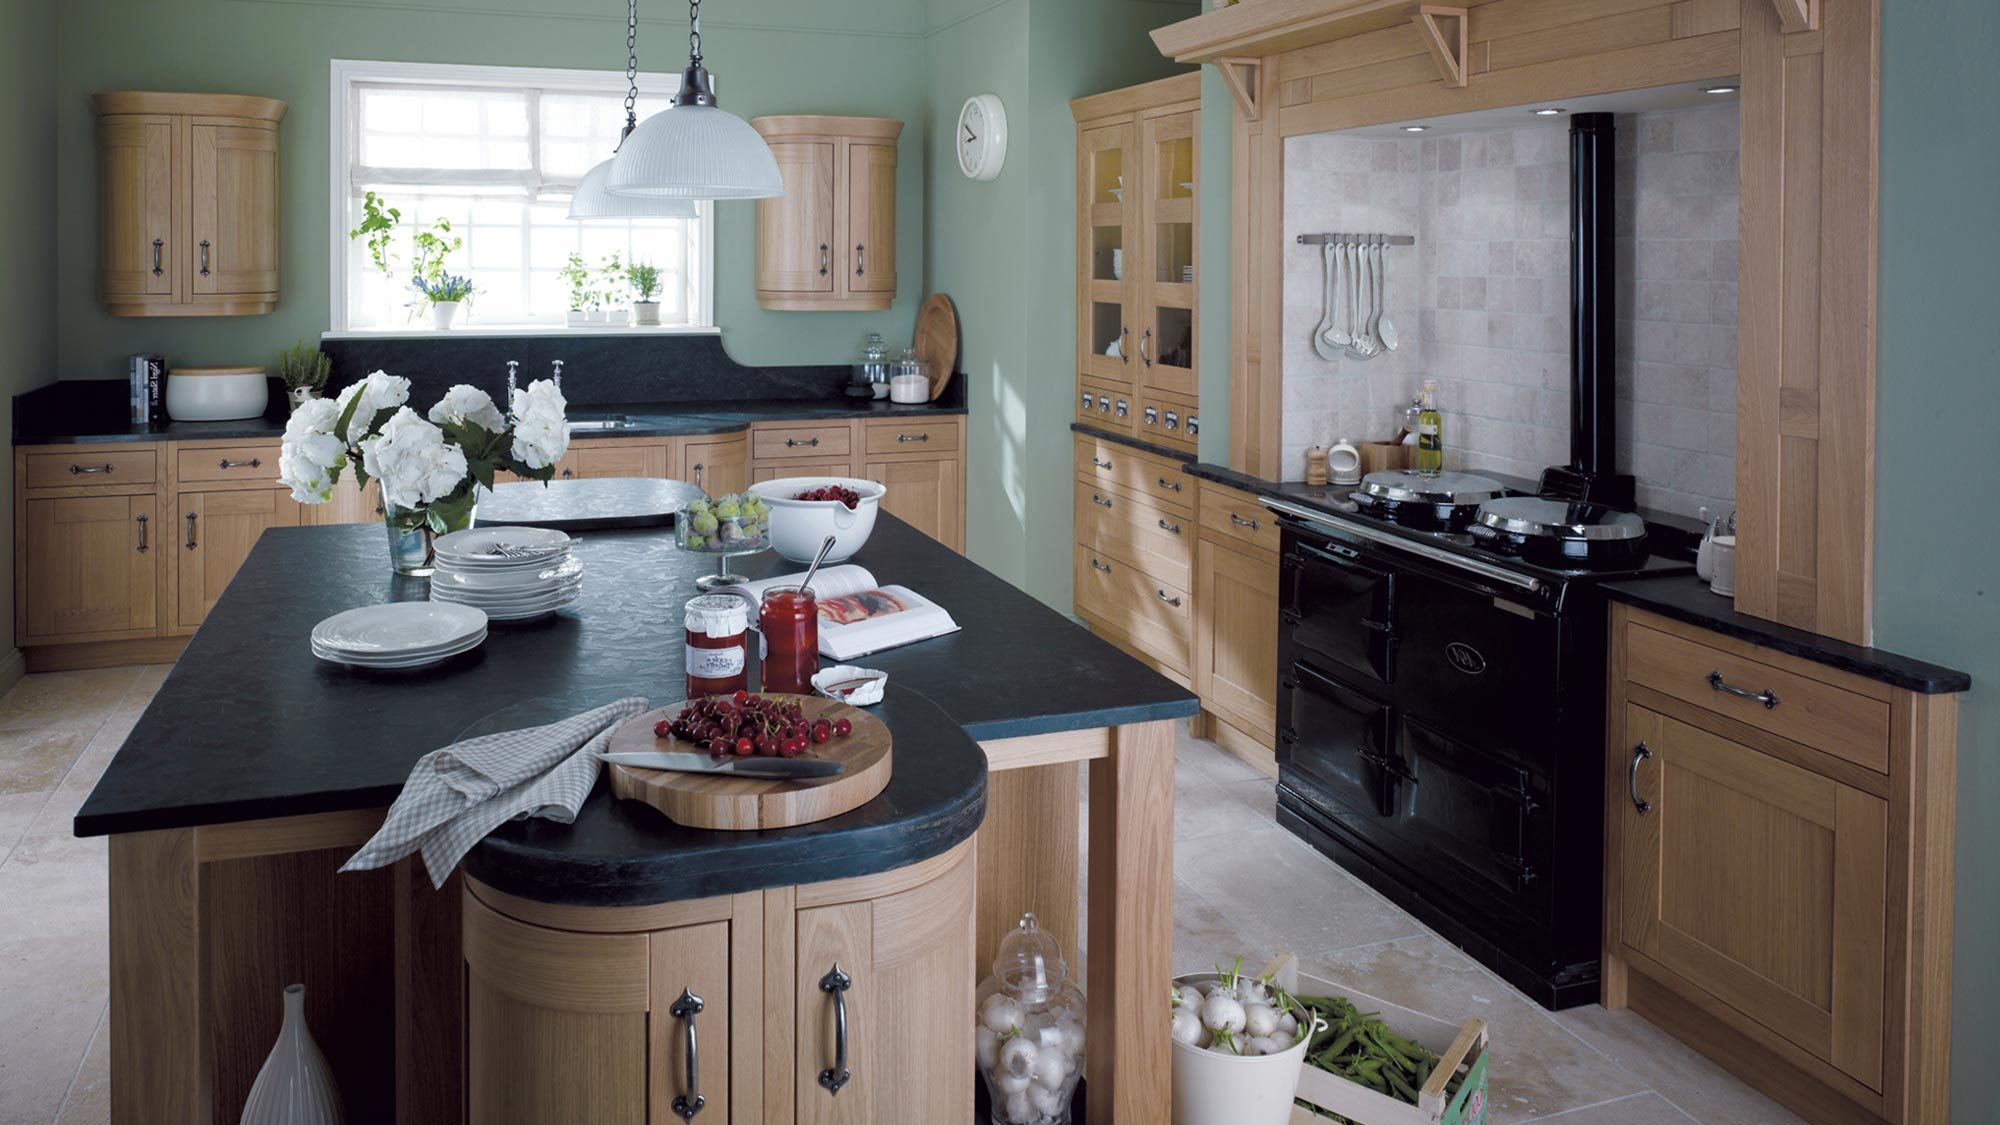 Interior of Kitchen in the Scottish Borders